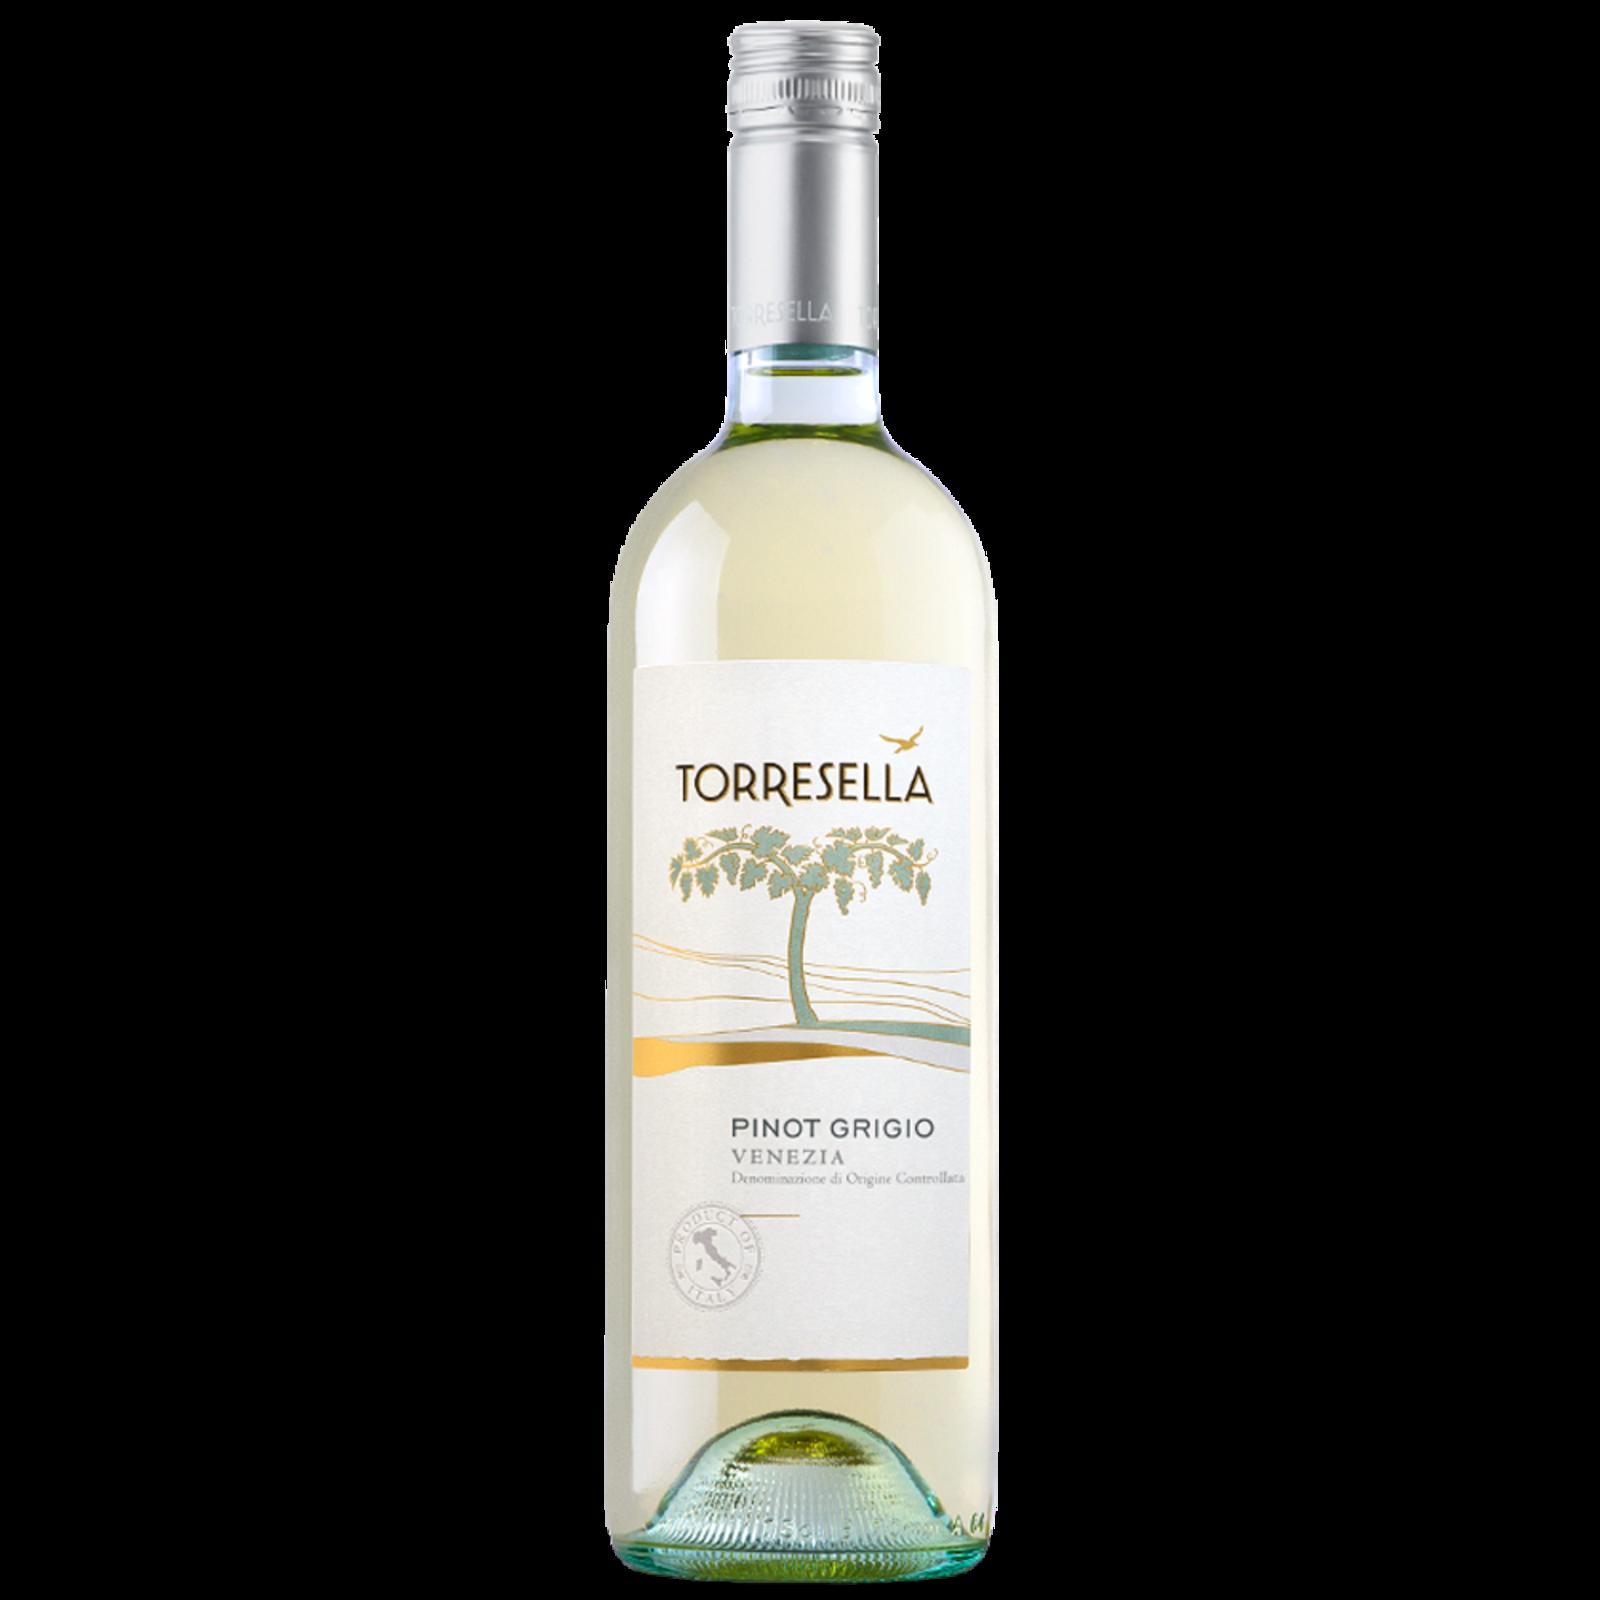 Cantine Torresella Torresella Pinot Grigio Venezia 2020